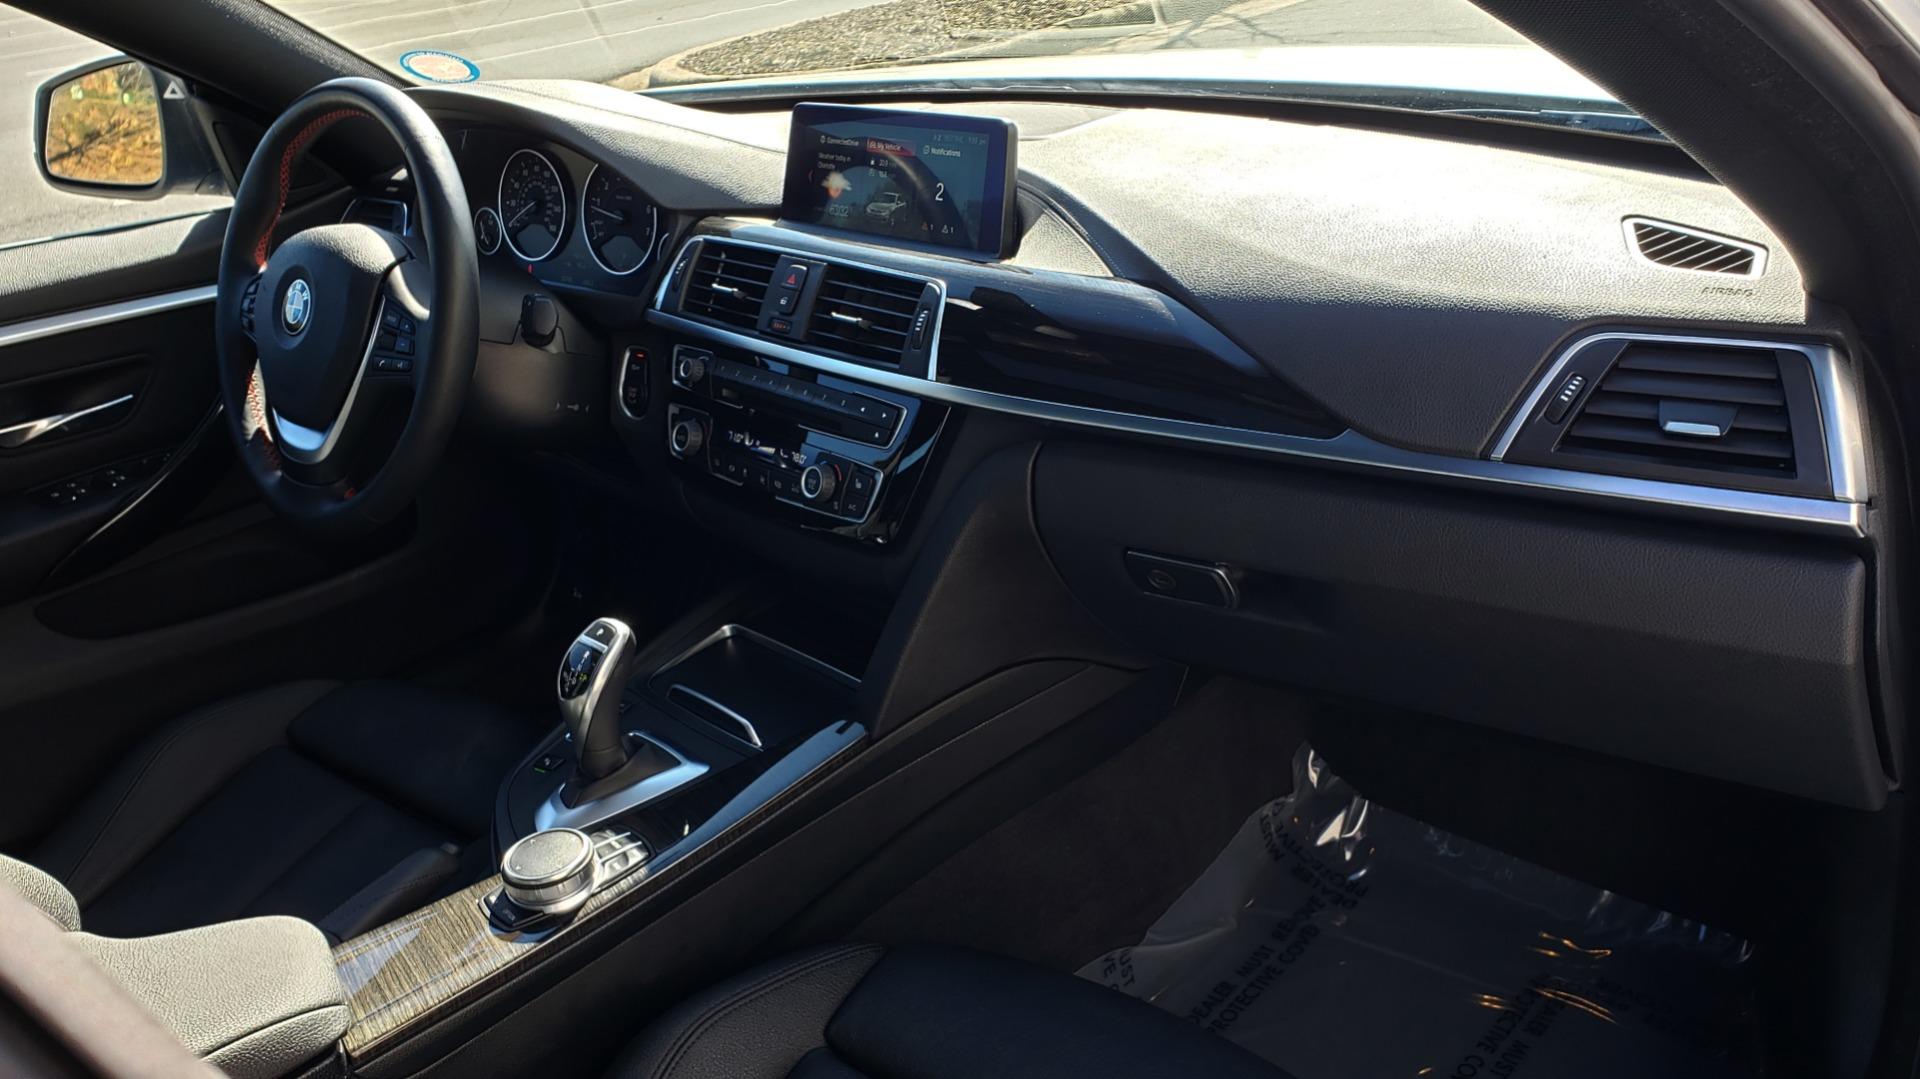 Used 2018 BMW 4 SERIES 430IXDRIVE / PREMIUM / NAV / SUNROOF / ESSENTIALS PKG for sale $27,795 at Formula Imports in Charlotte NC 28227 71